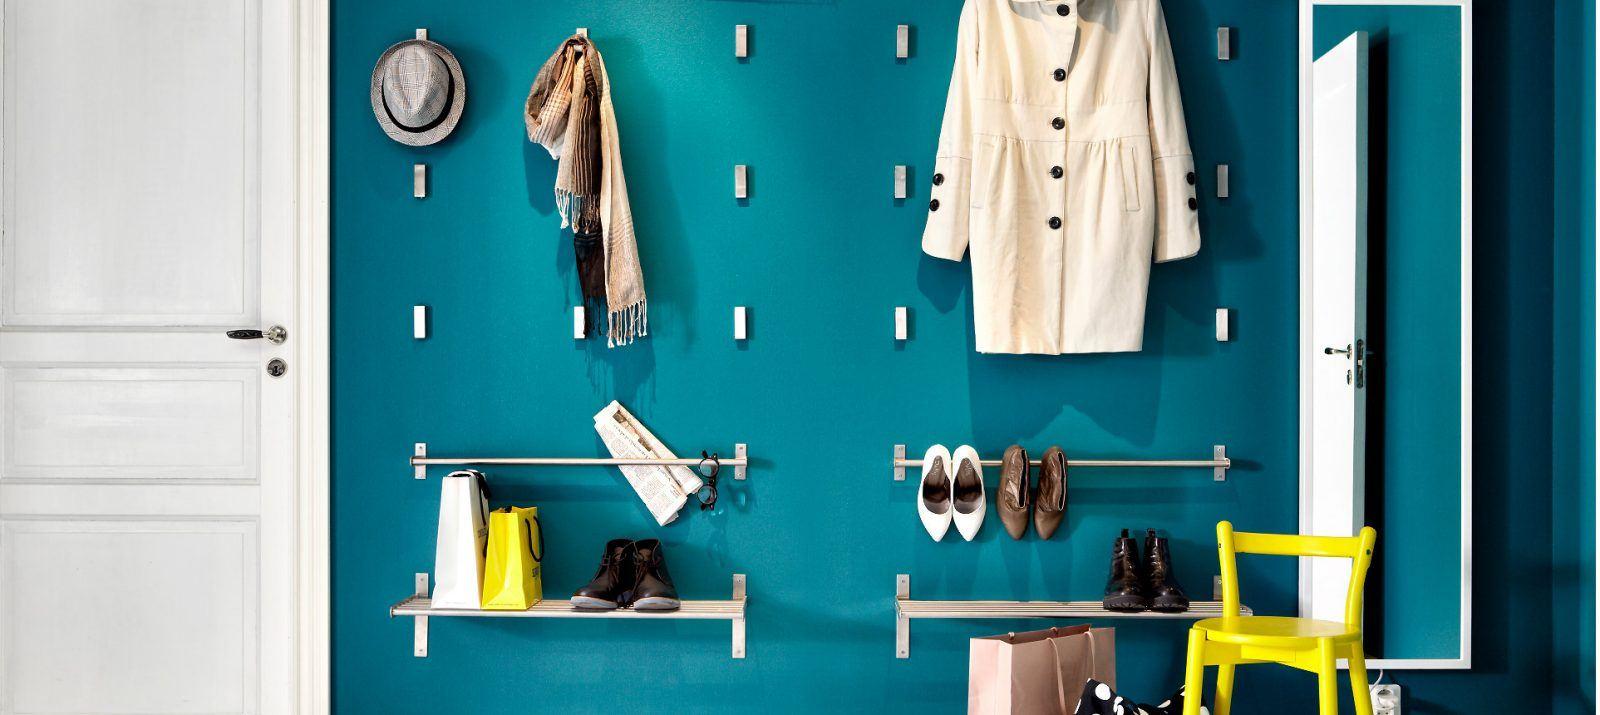 ikea-bjarnum-folding-hooks-bedroom-storage-hacks-solutions-e1463086992502-1600x715.jpg